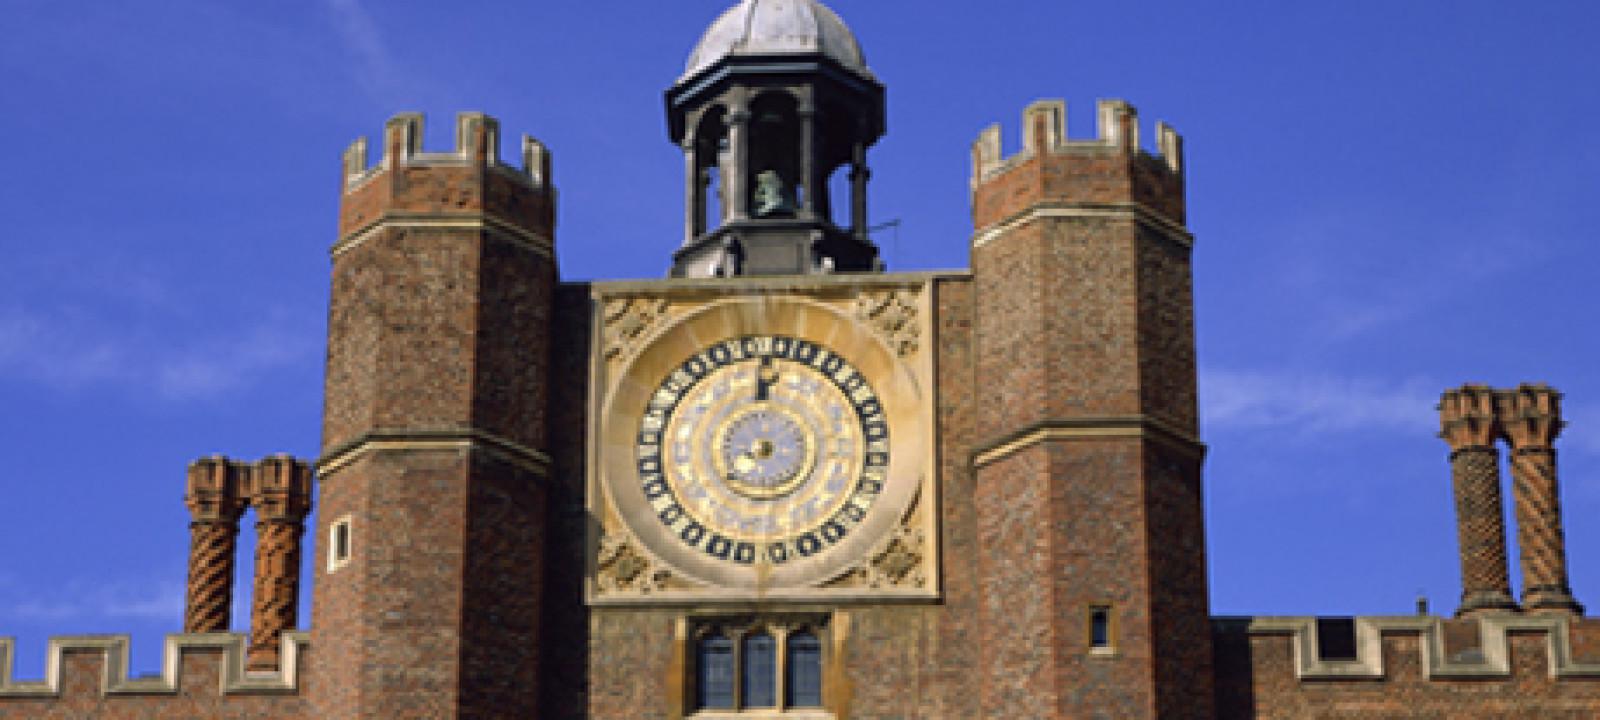 Clock Court, Hampton Court, Greater London, England, United King